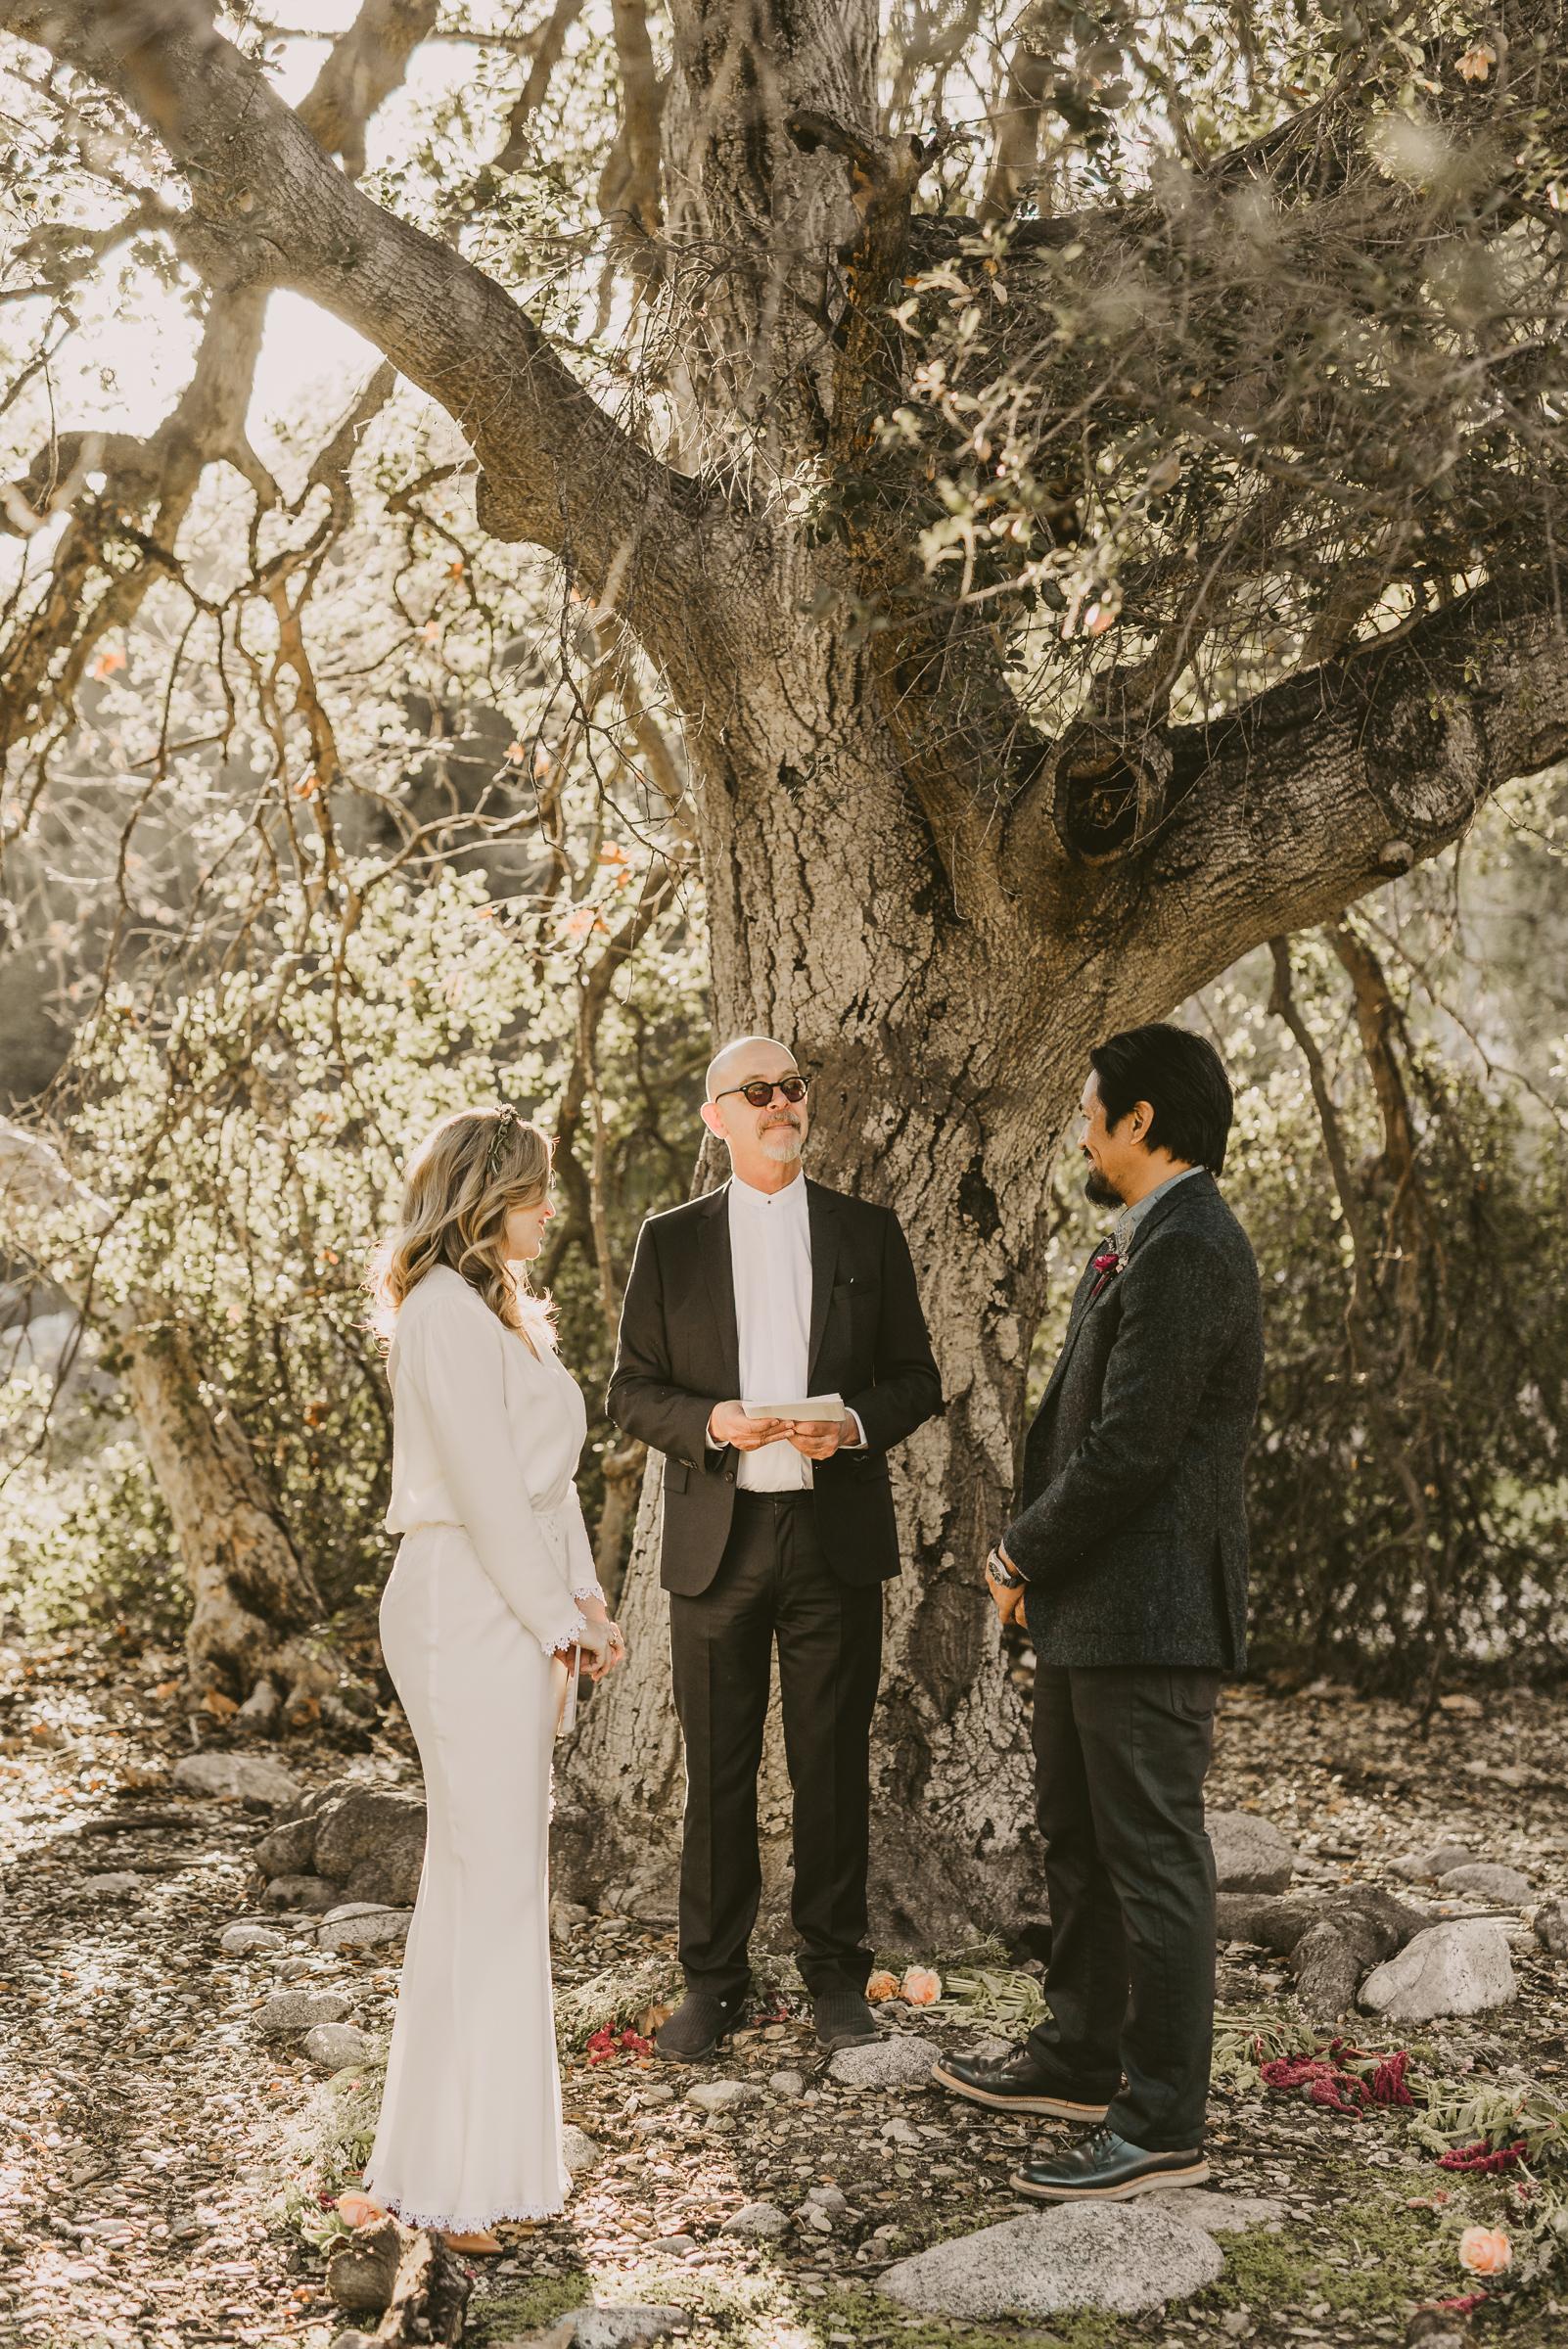 ©Isaiah + Taylor Photography - Intimate Elopement, Eaton Canyon, Los Angeles Wedding Photographer-36.jpg